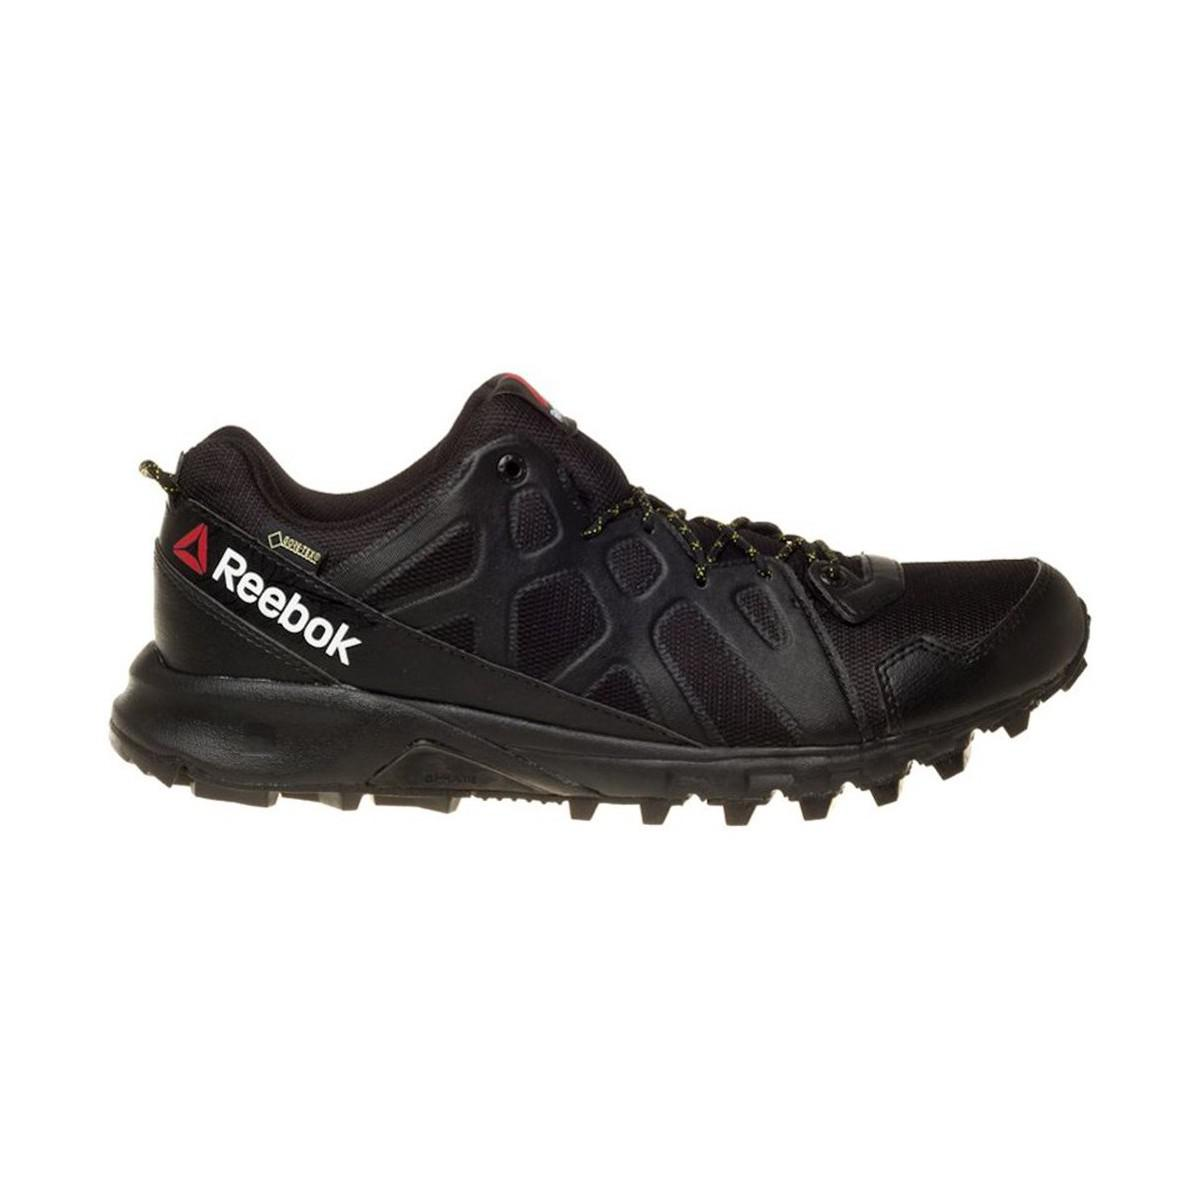 9528df830c6be Reebok Sawcut 40 Gtx Men s Shoes (trainers) In Black in Black for ...